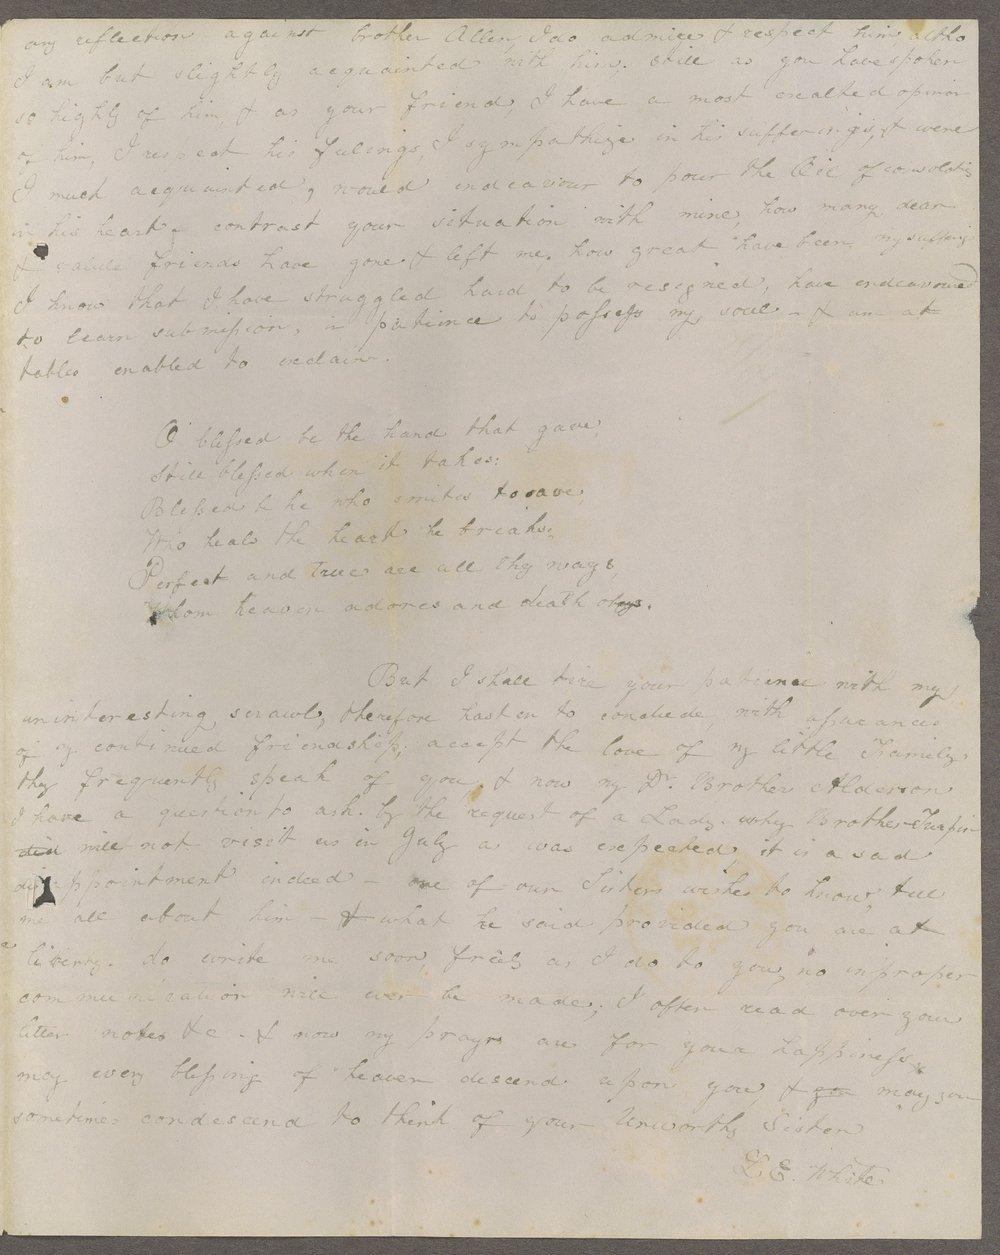 Louisa E. White to Lewis Allen Alderson - 7